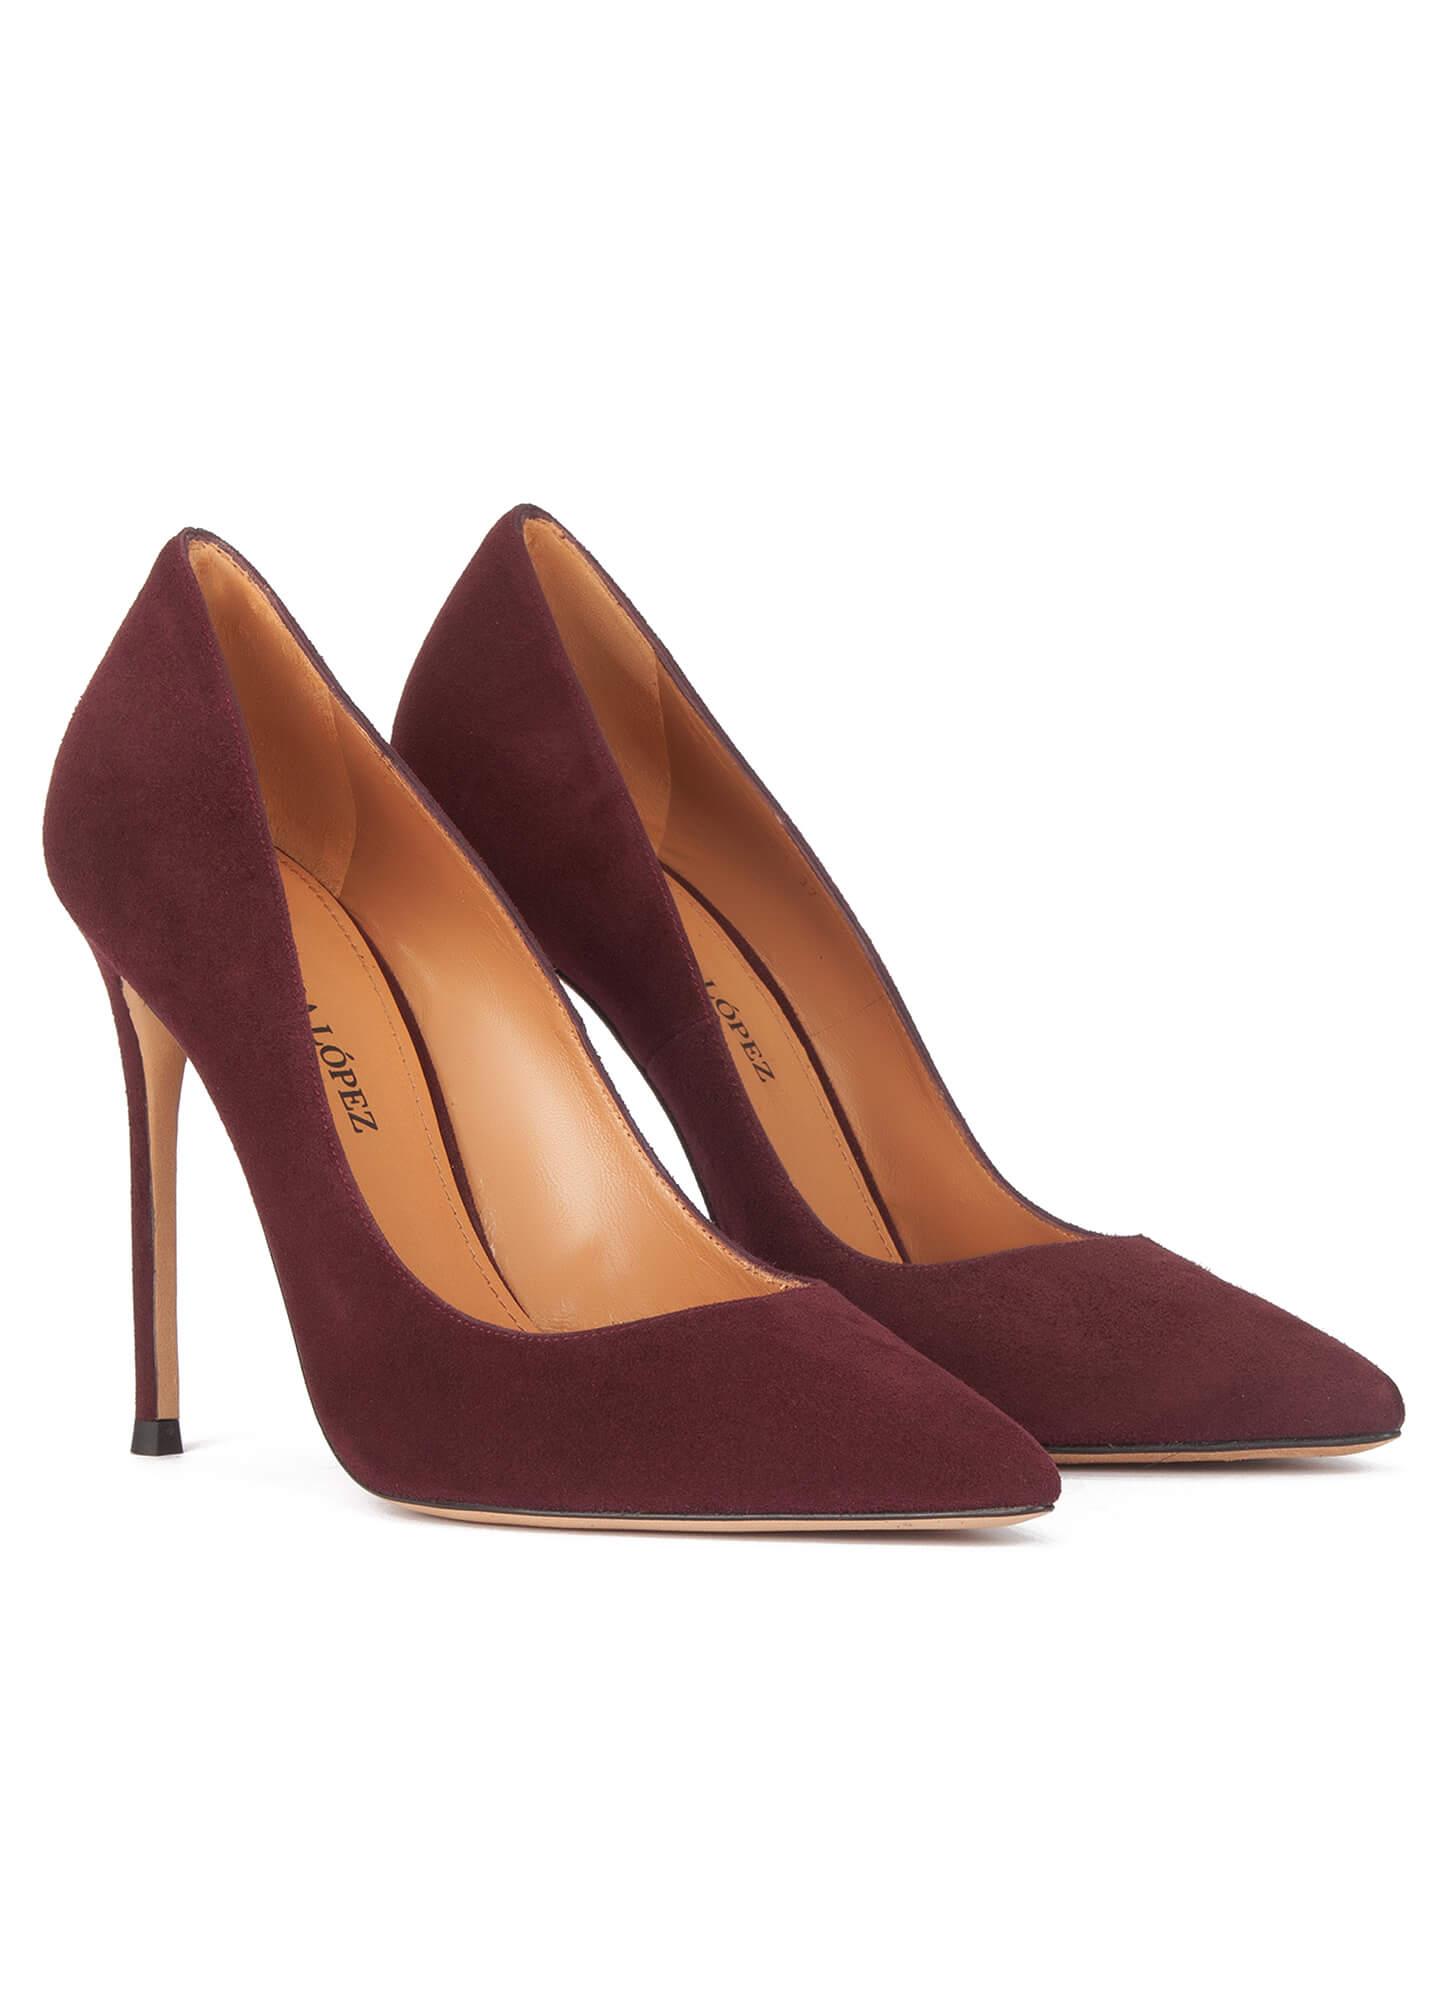 78bb01ac0 Kameron Pura López. High heel pumps in burgundy suede High heel pumps in  burgundy suede ...